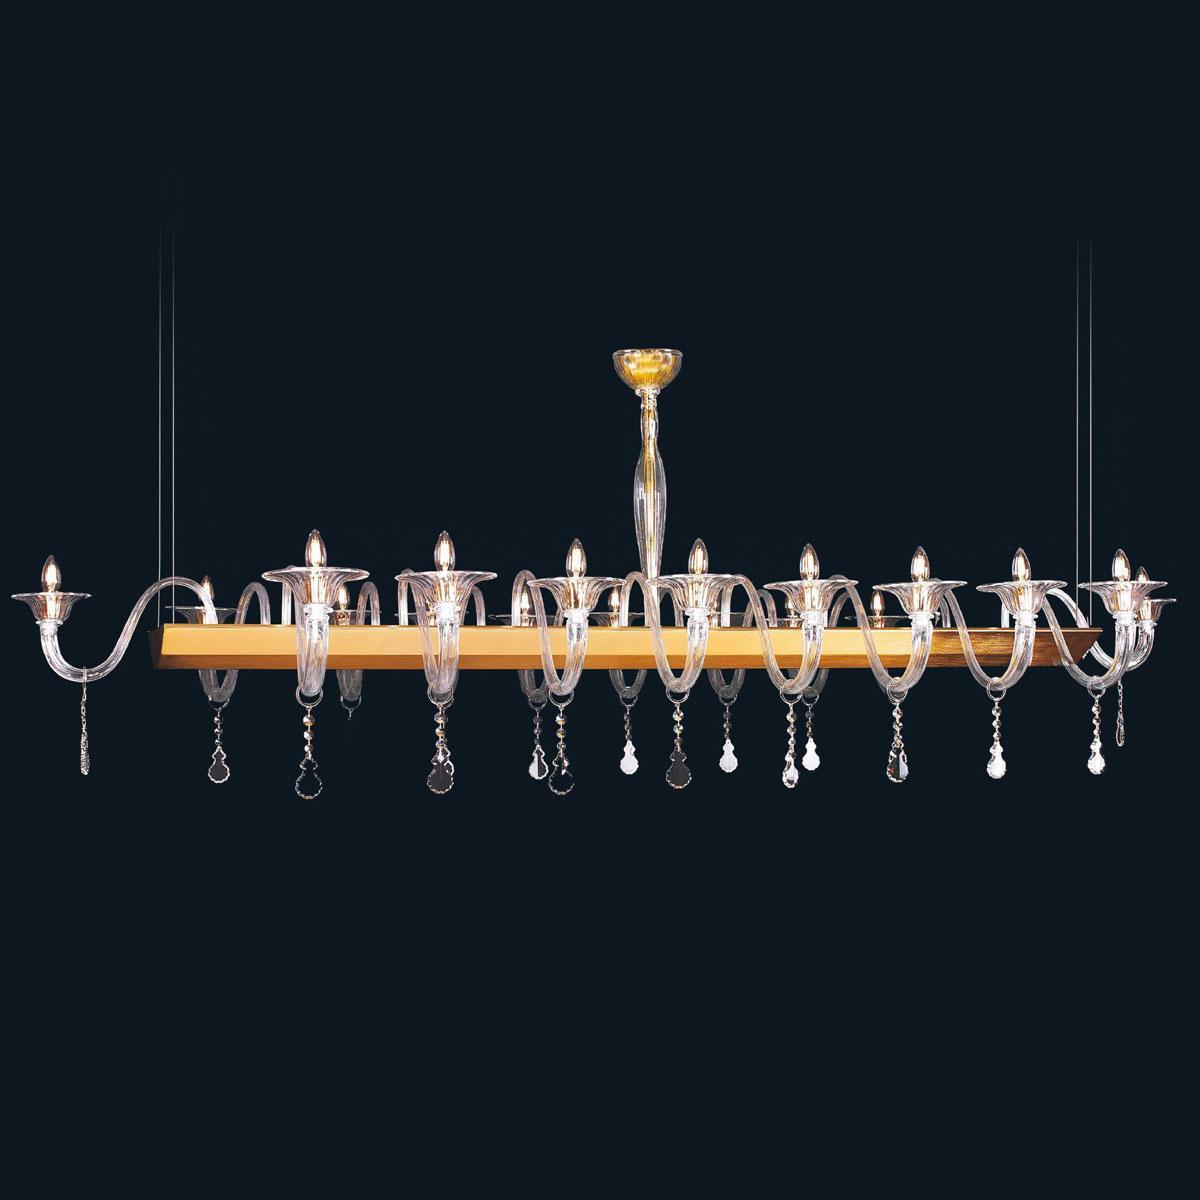 """Nadia"" Murano glass chandelier - 18 lights - transparent"